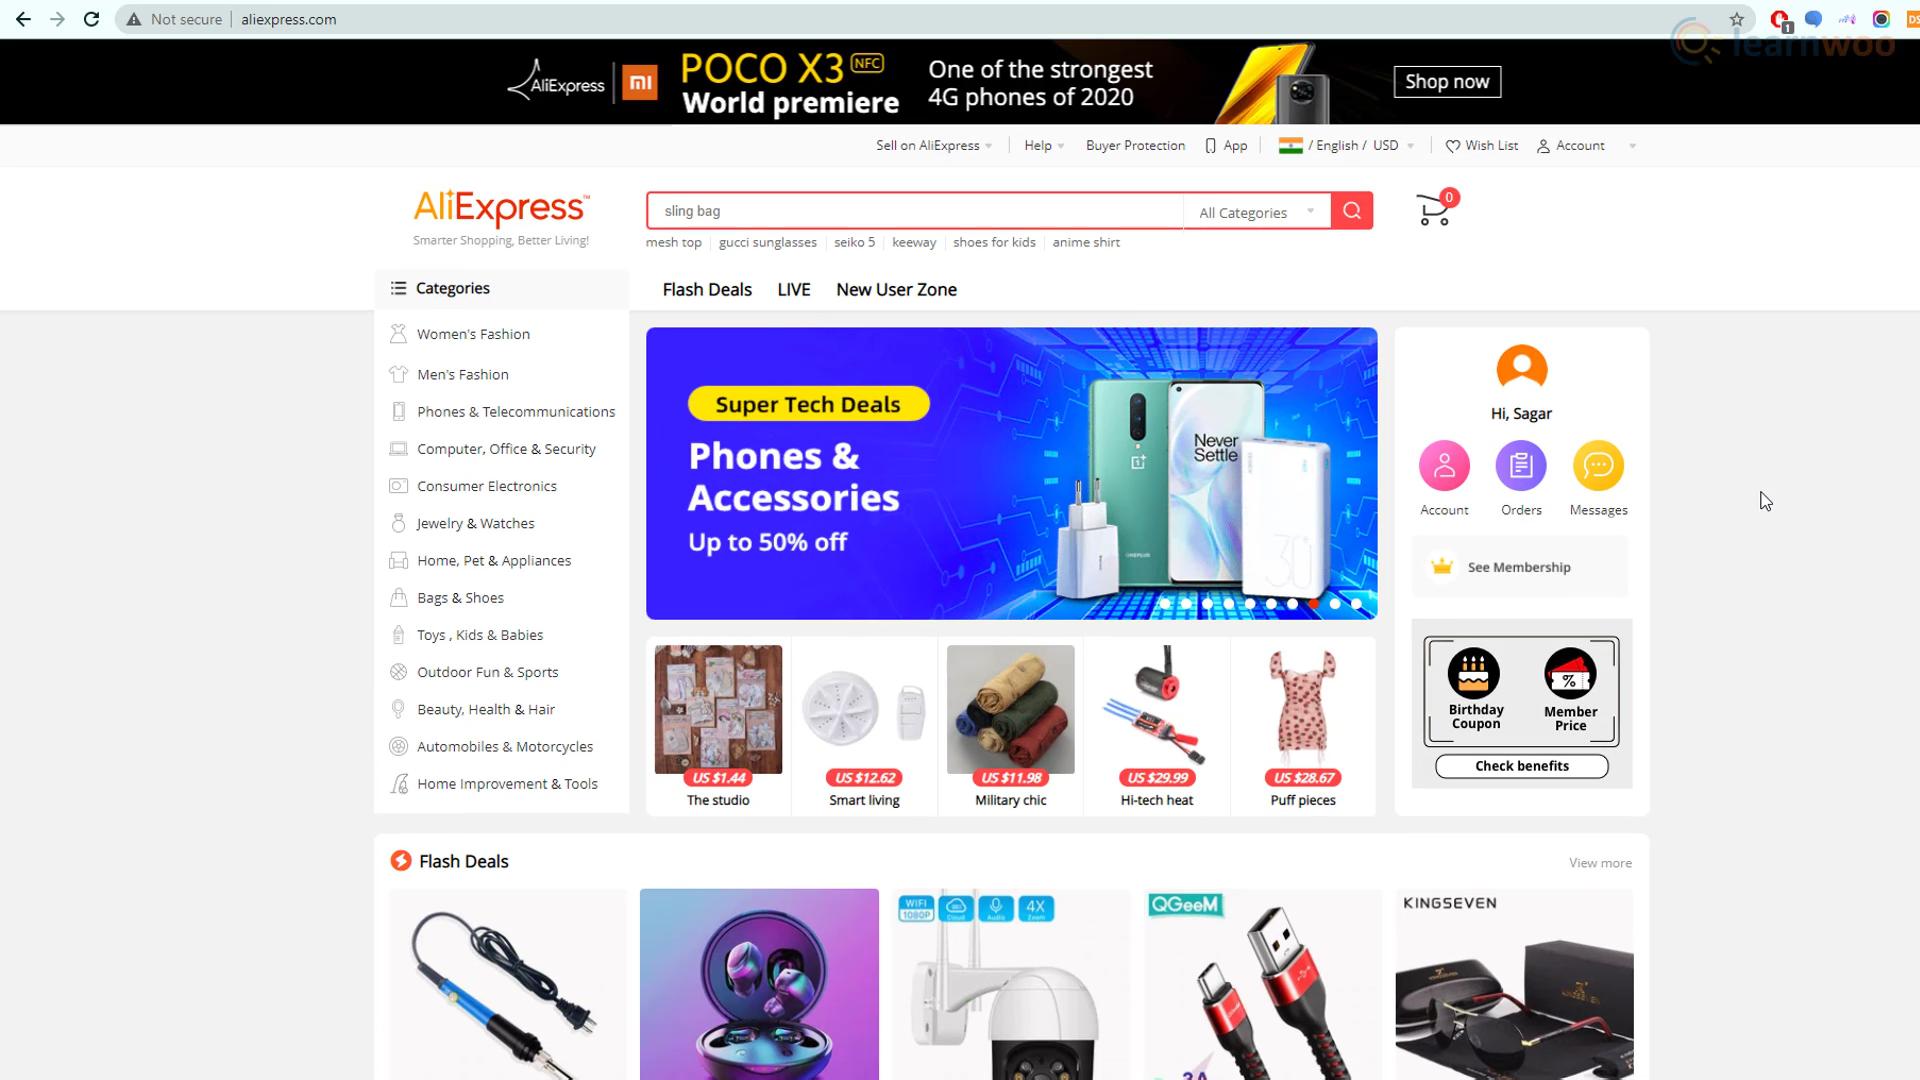 AliExpress website